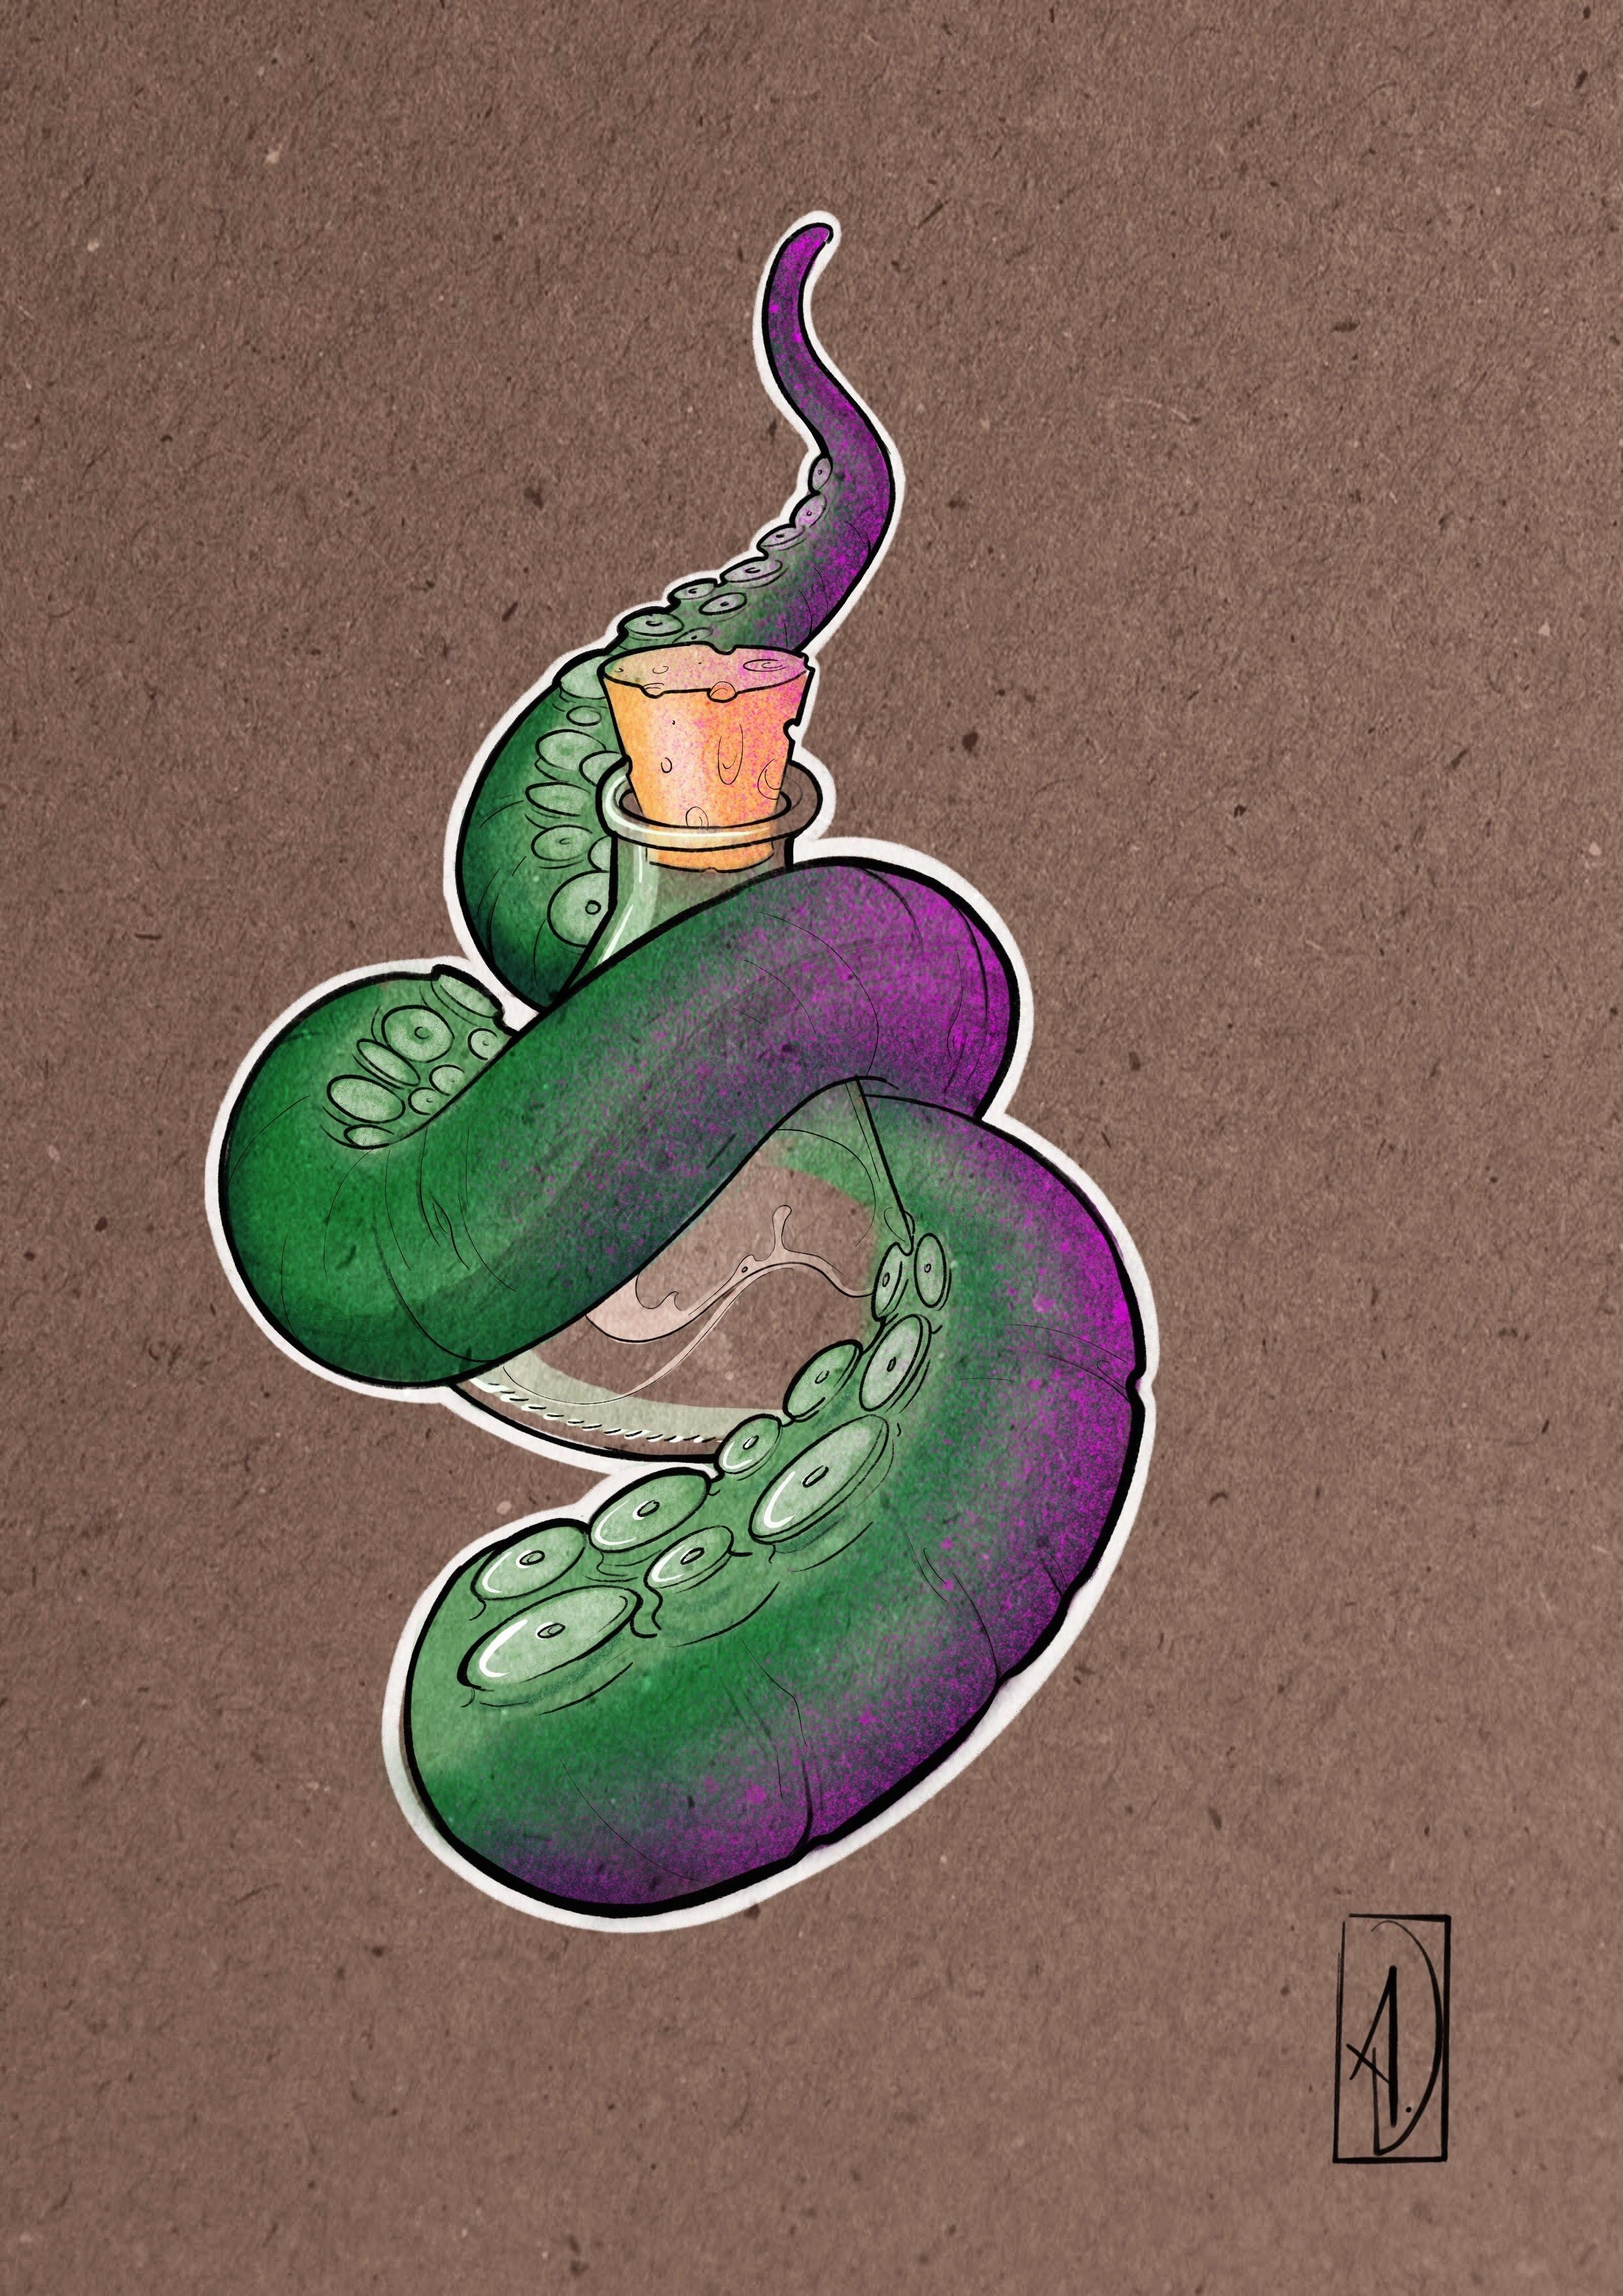 flash tattoo néo-traditional tentacle potion élixir tentacule lyon corbas